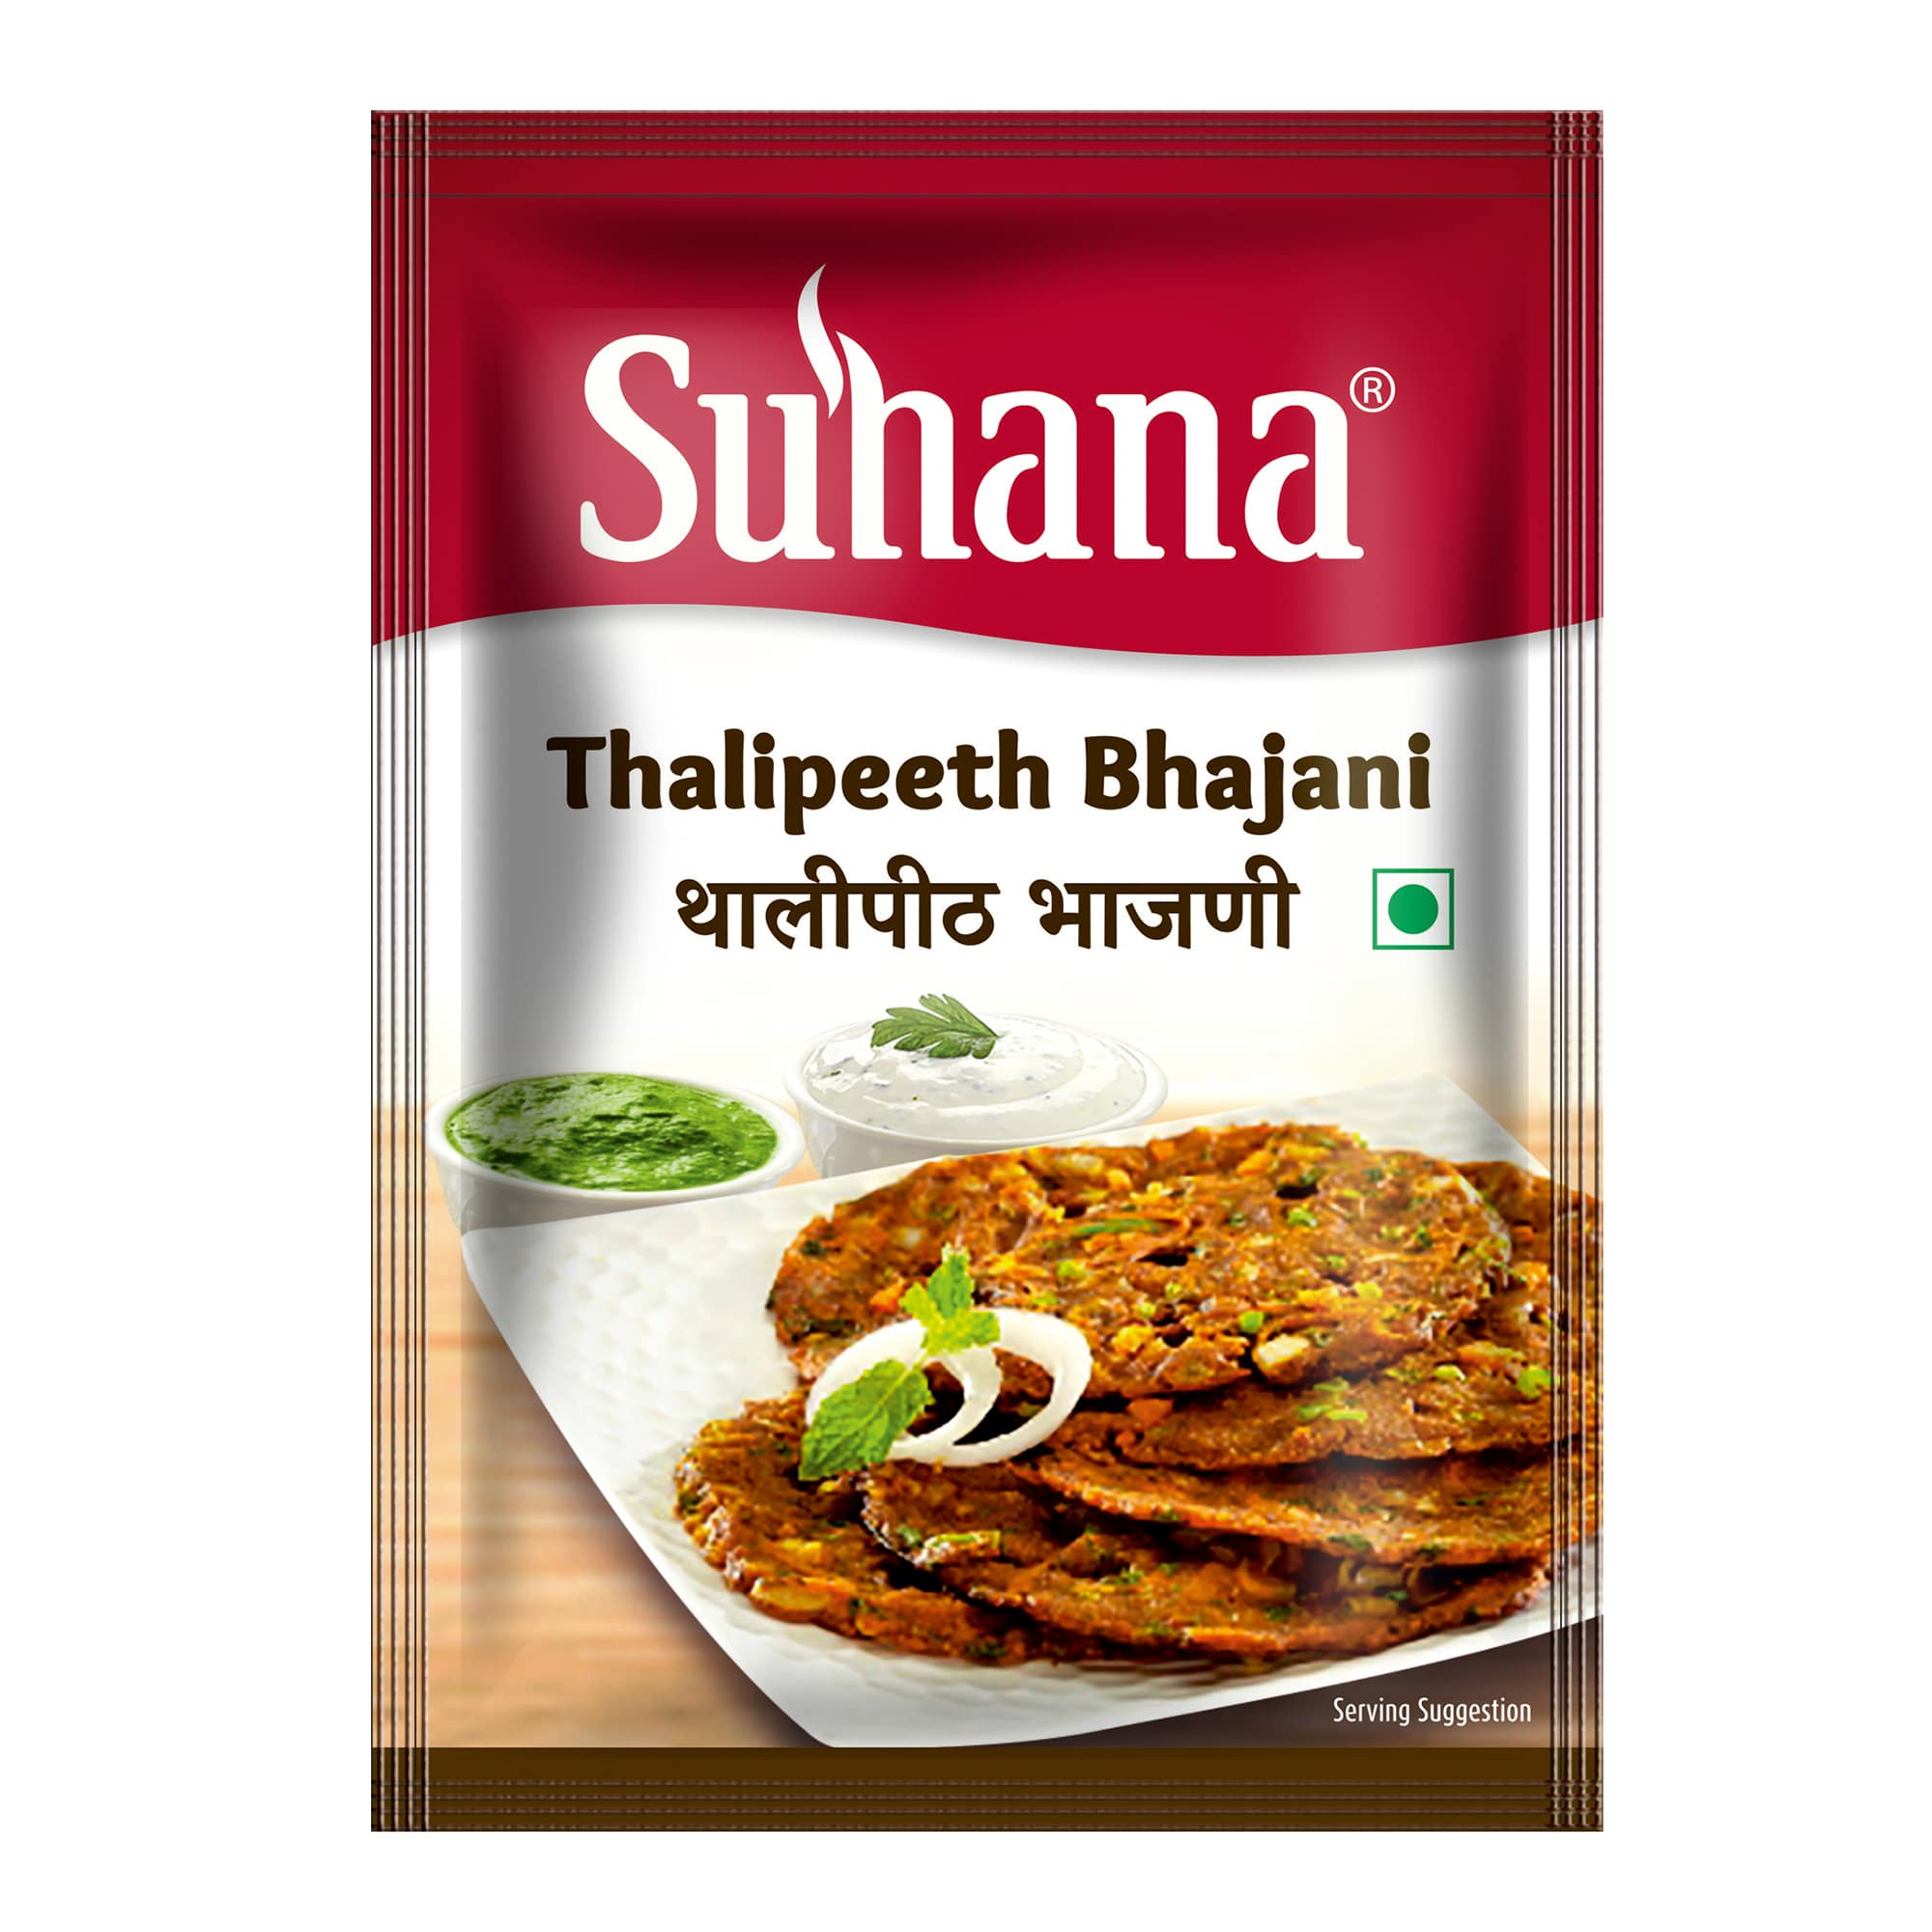 Suhana Thalipeeth Bhajani 200 g Pouch